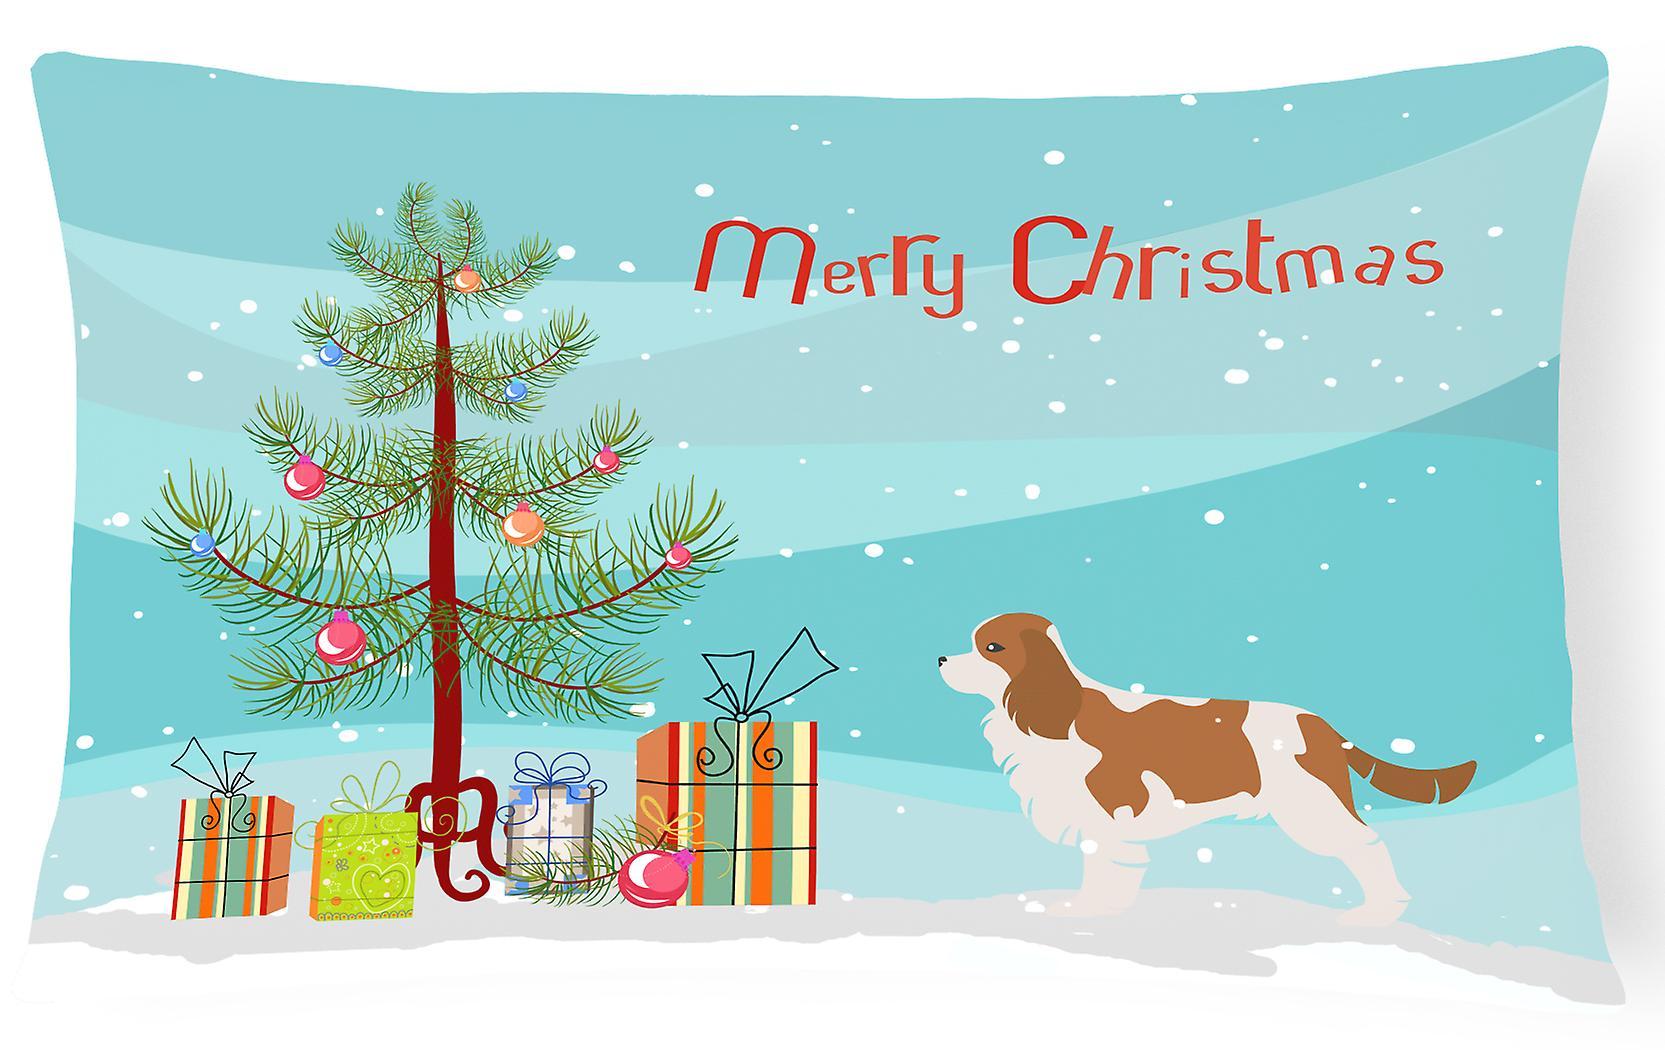 Pilule Décoratif King Tissu Merry Cavalier Charles Christmas Toile Tree Spaniel 8wm0nN